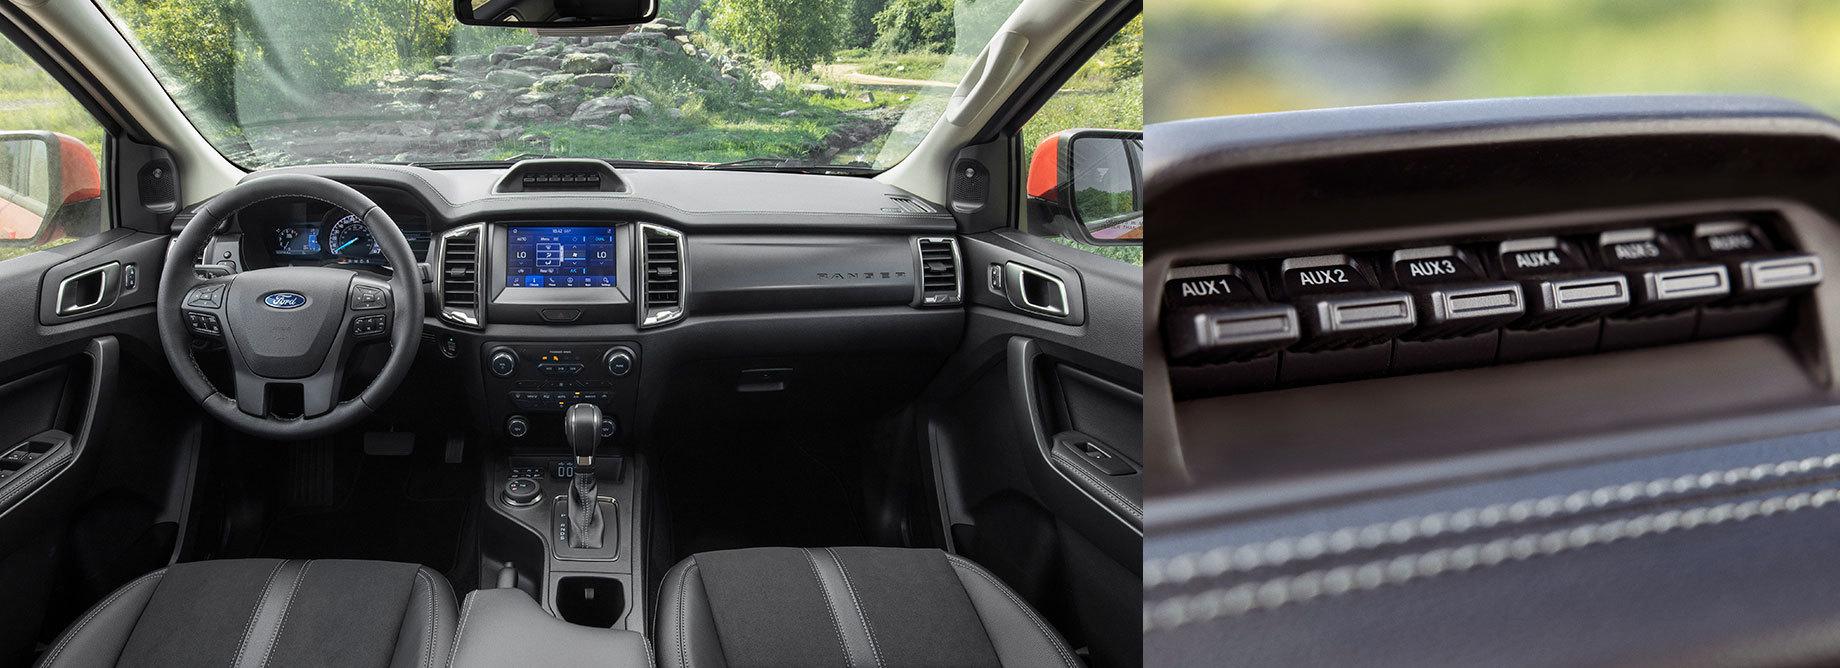 Офроуд-пакет Tremor поднимет Ford Ranger нановую высоту